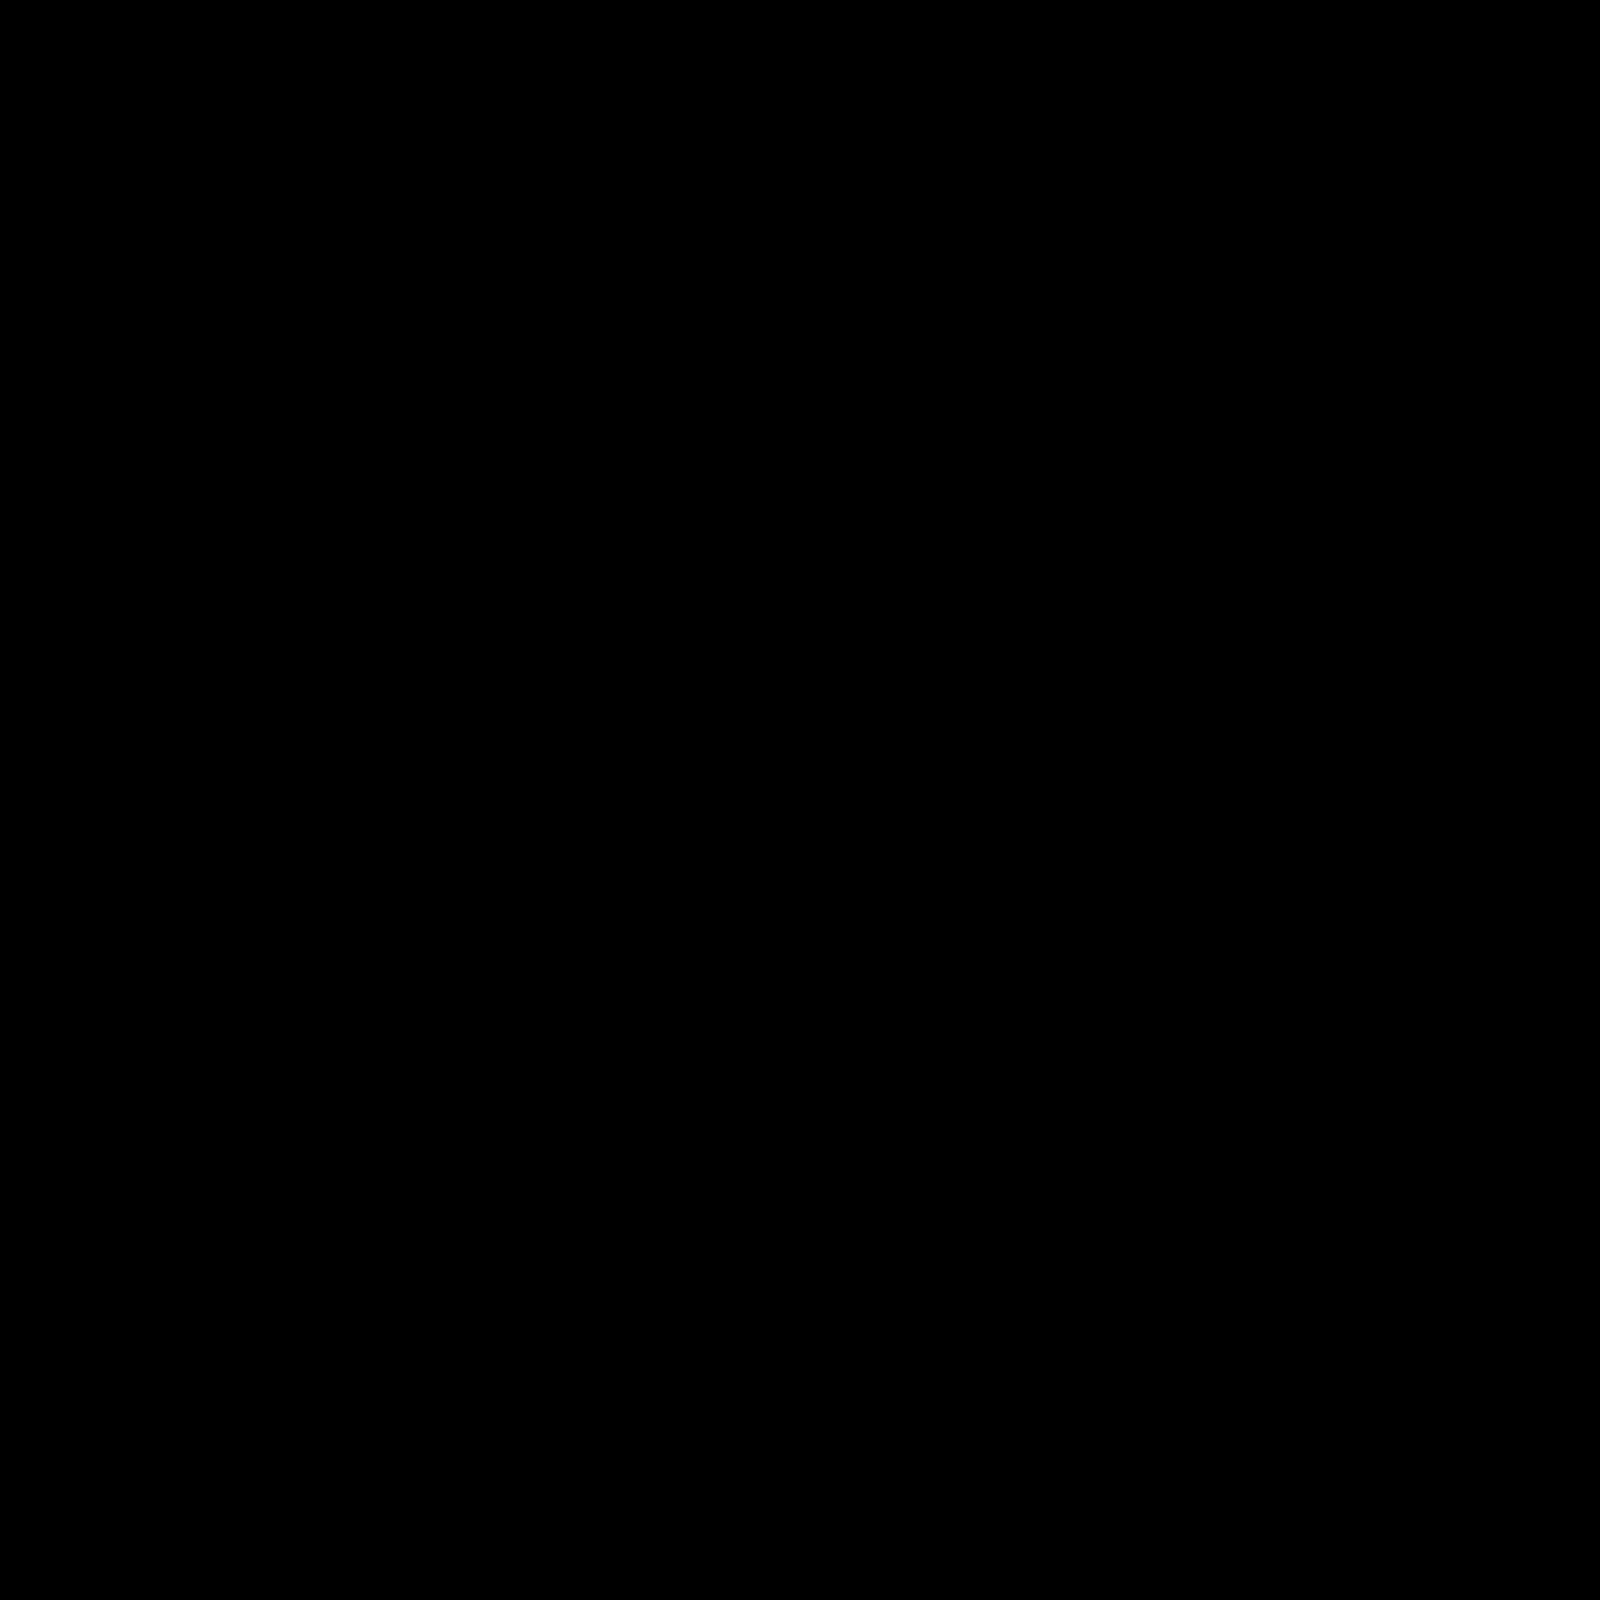 Dzwonek icon